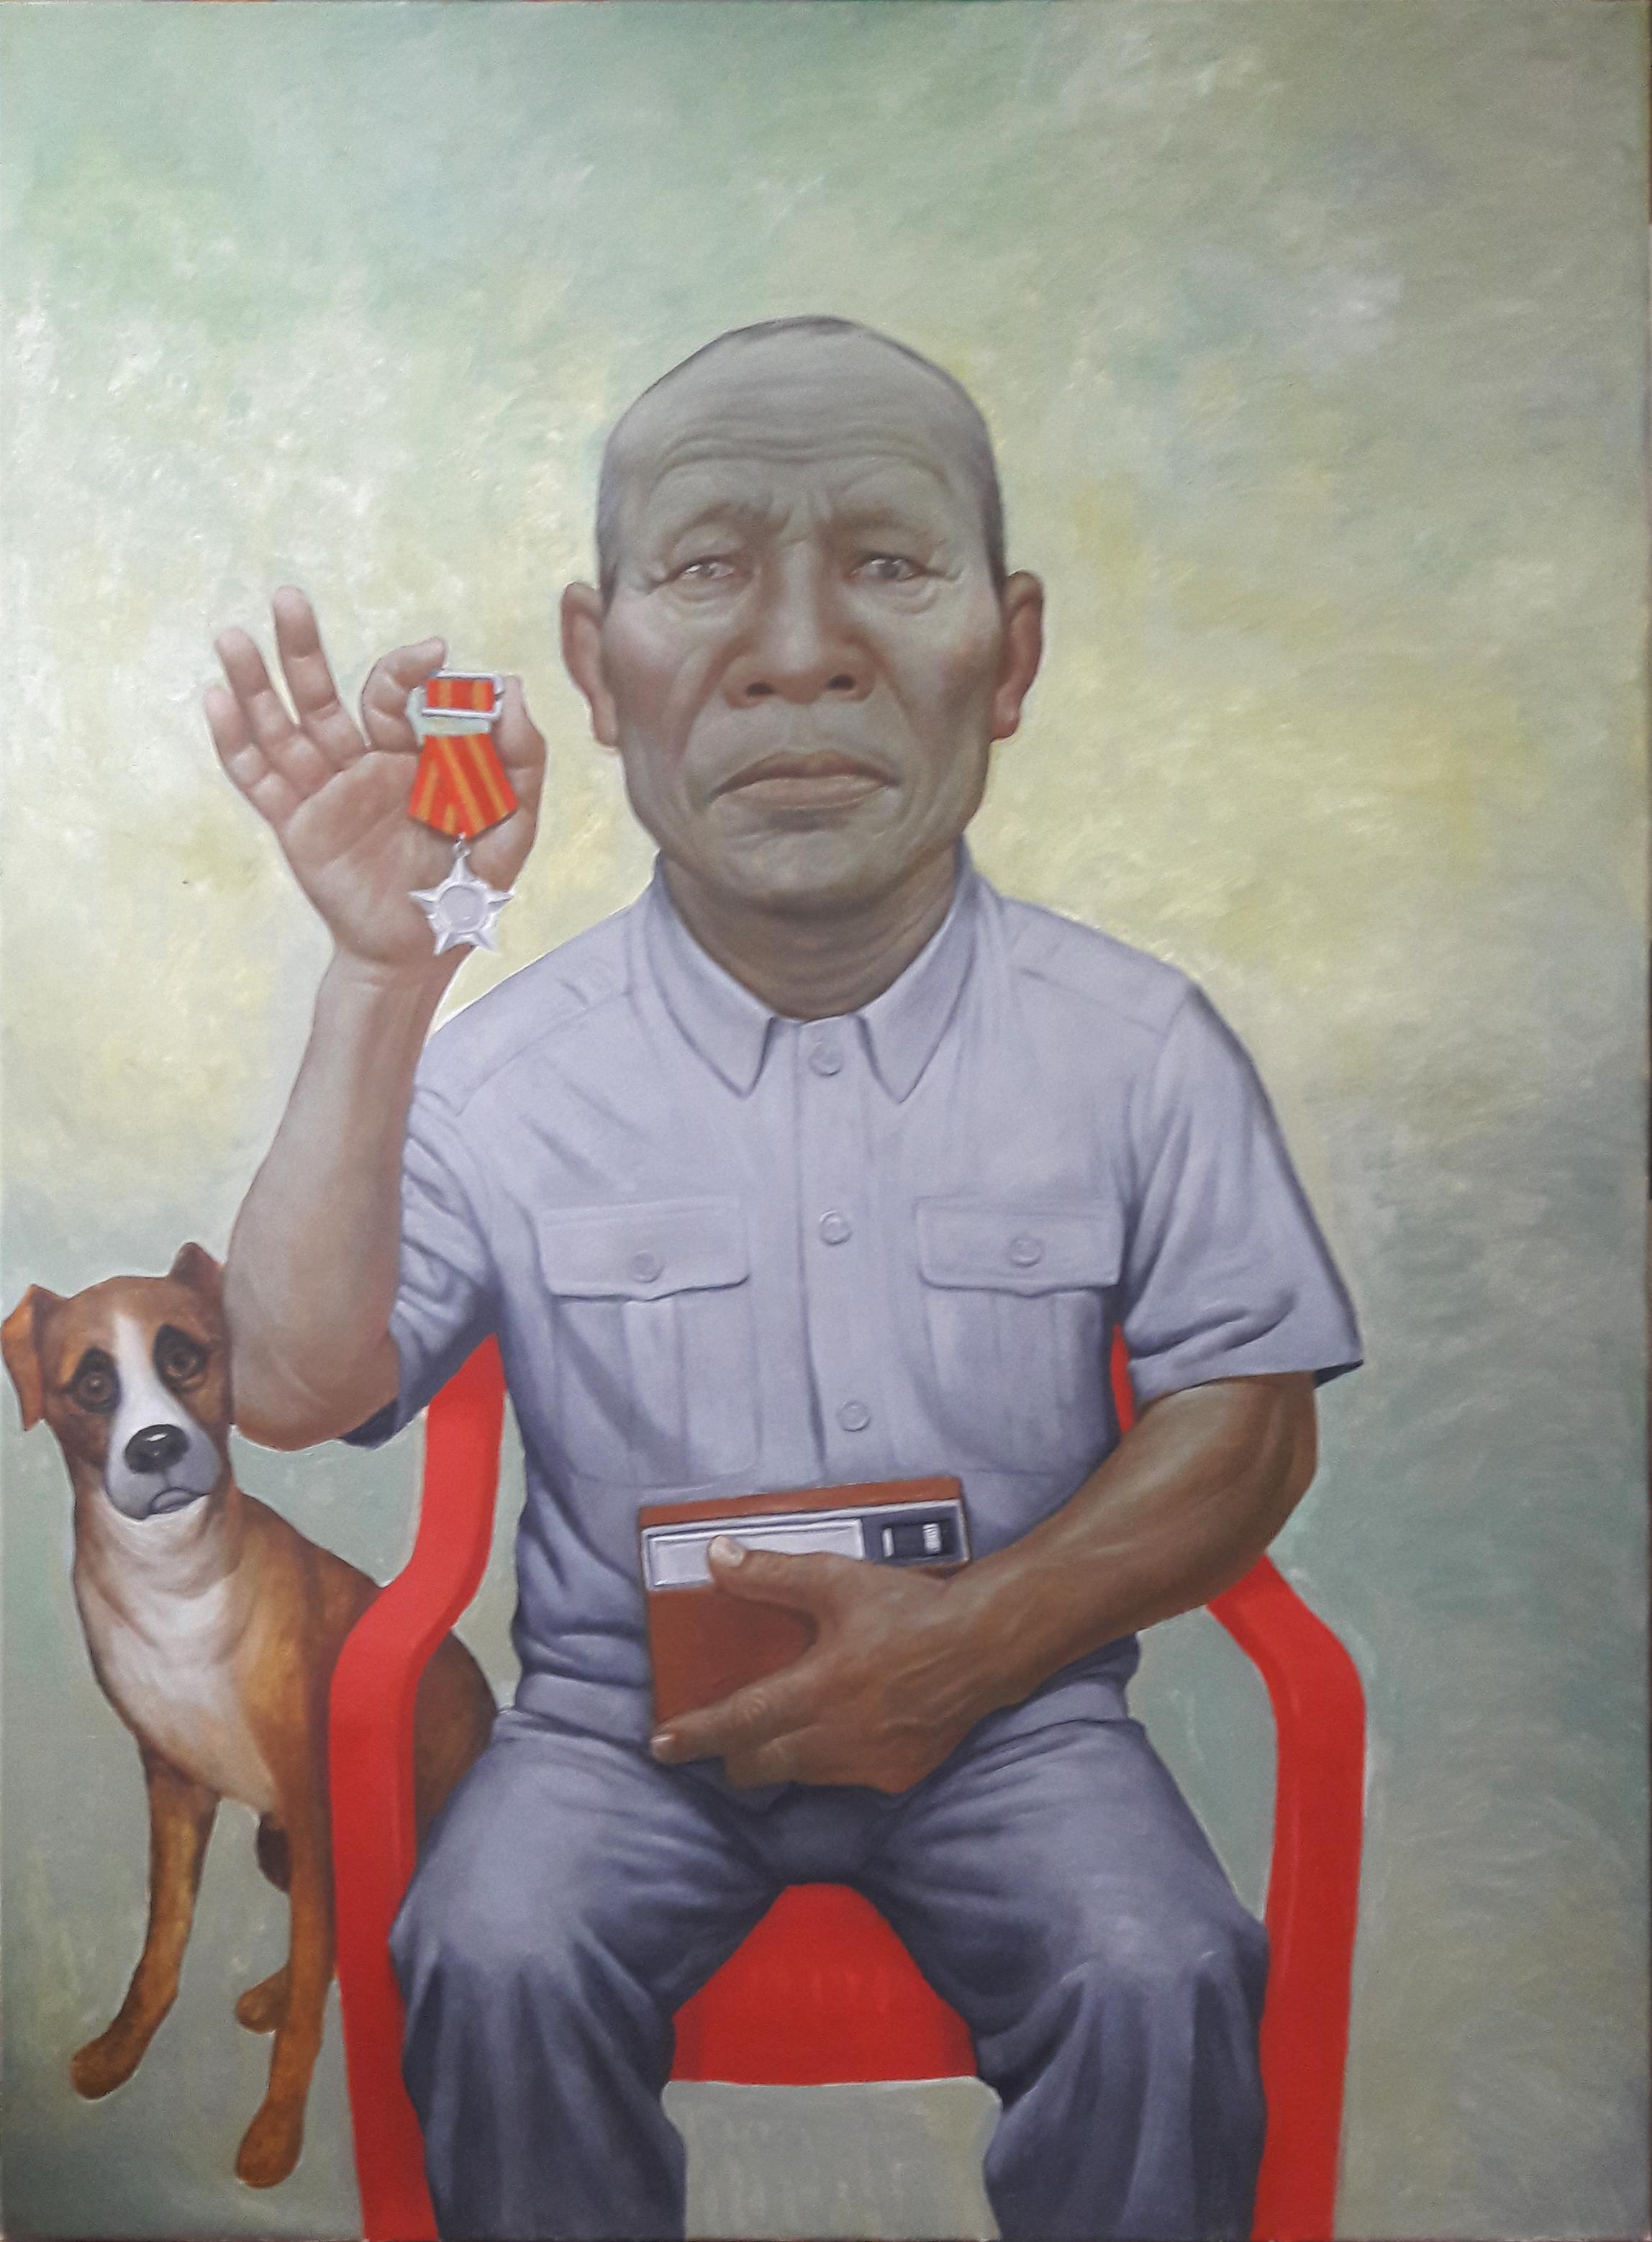 Nguyen-Hung-Son--Vietnam-Veteran-cuu-chien-binh-2017-160x120-cm